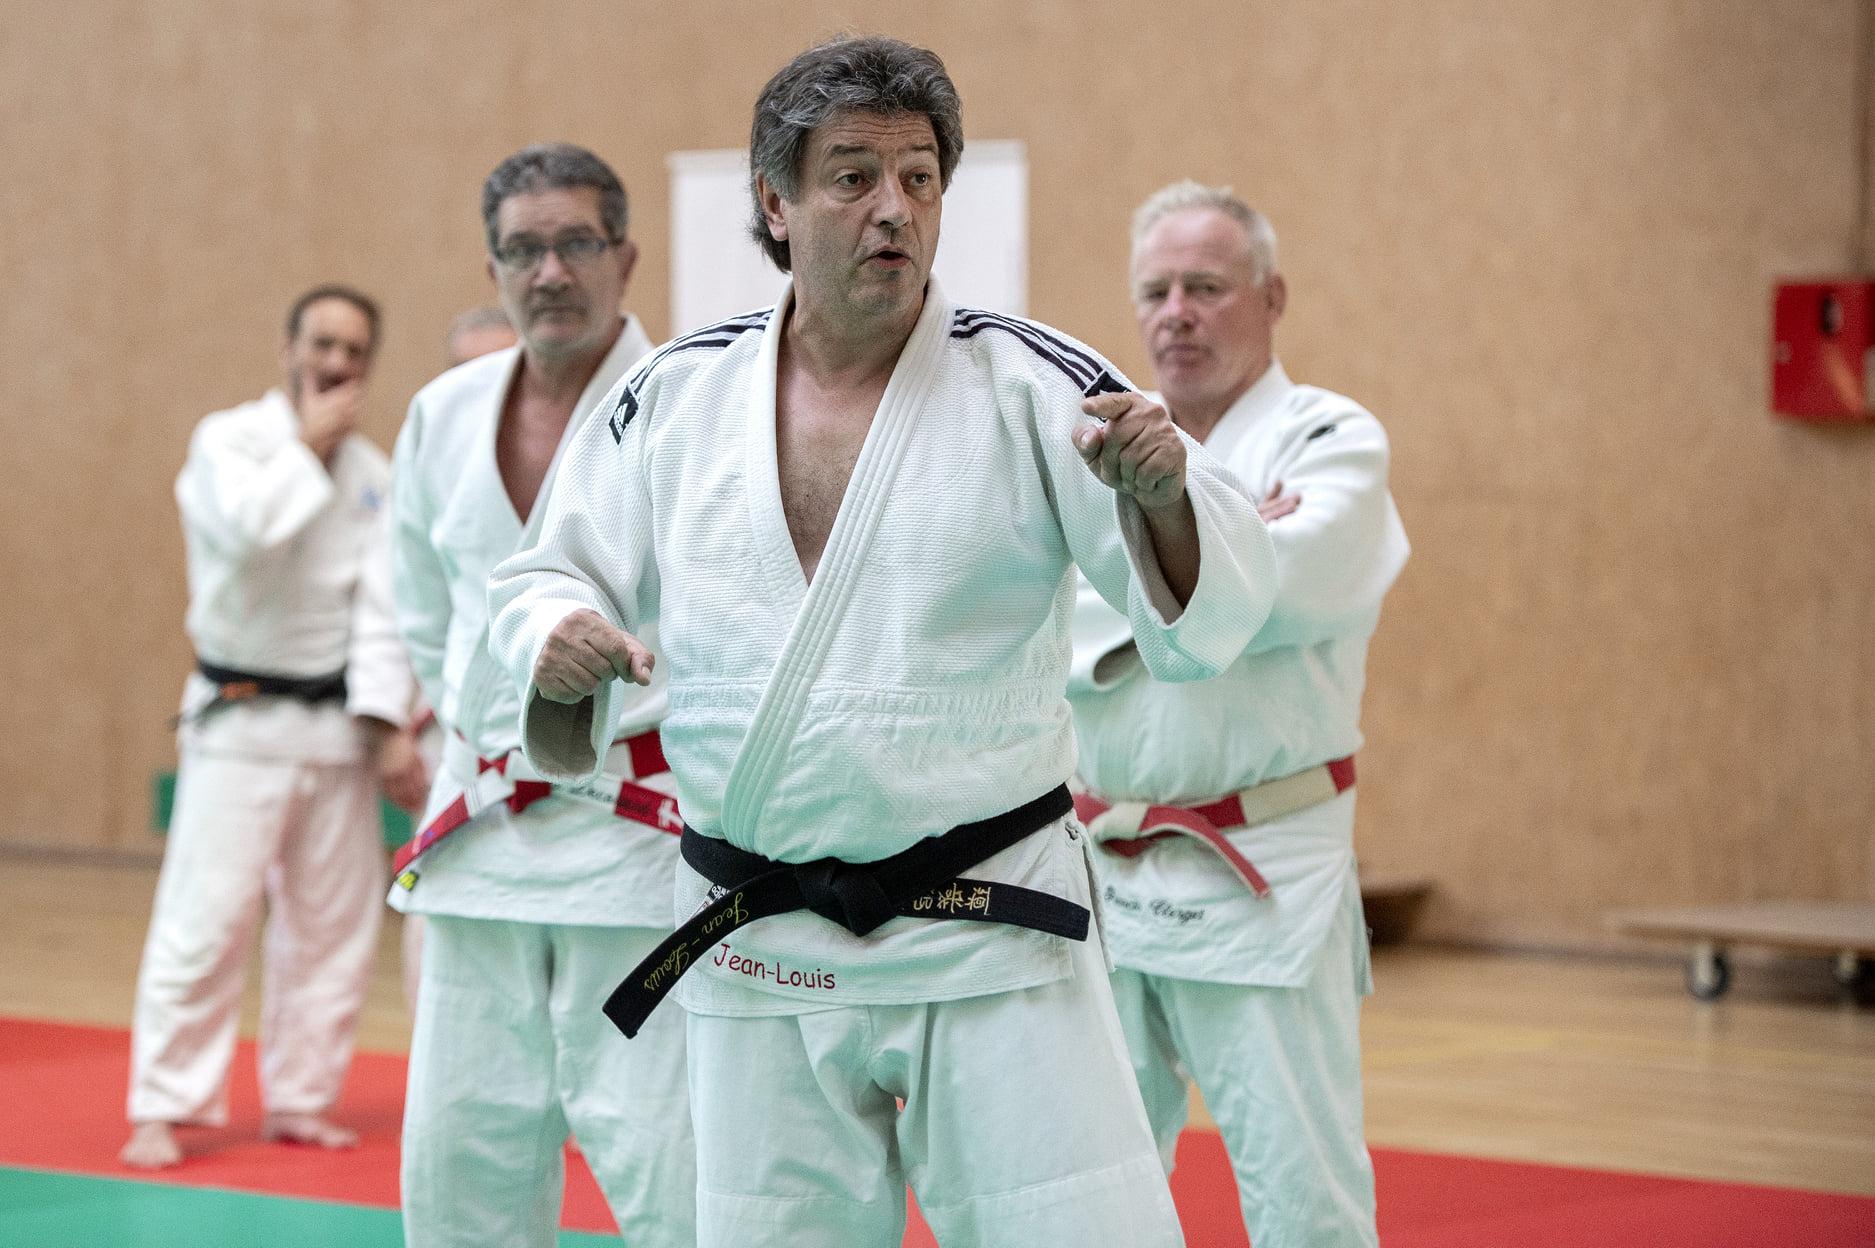 L'Esprit du Judo - Présentation LGEJ & IJC - 05.08.2020